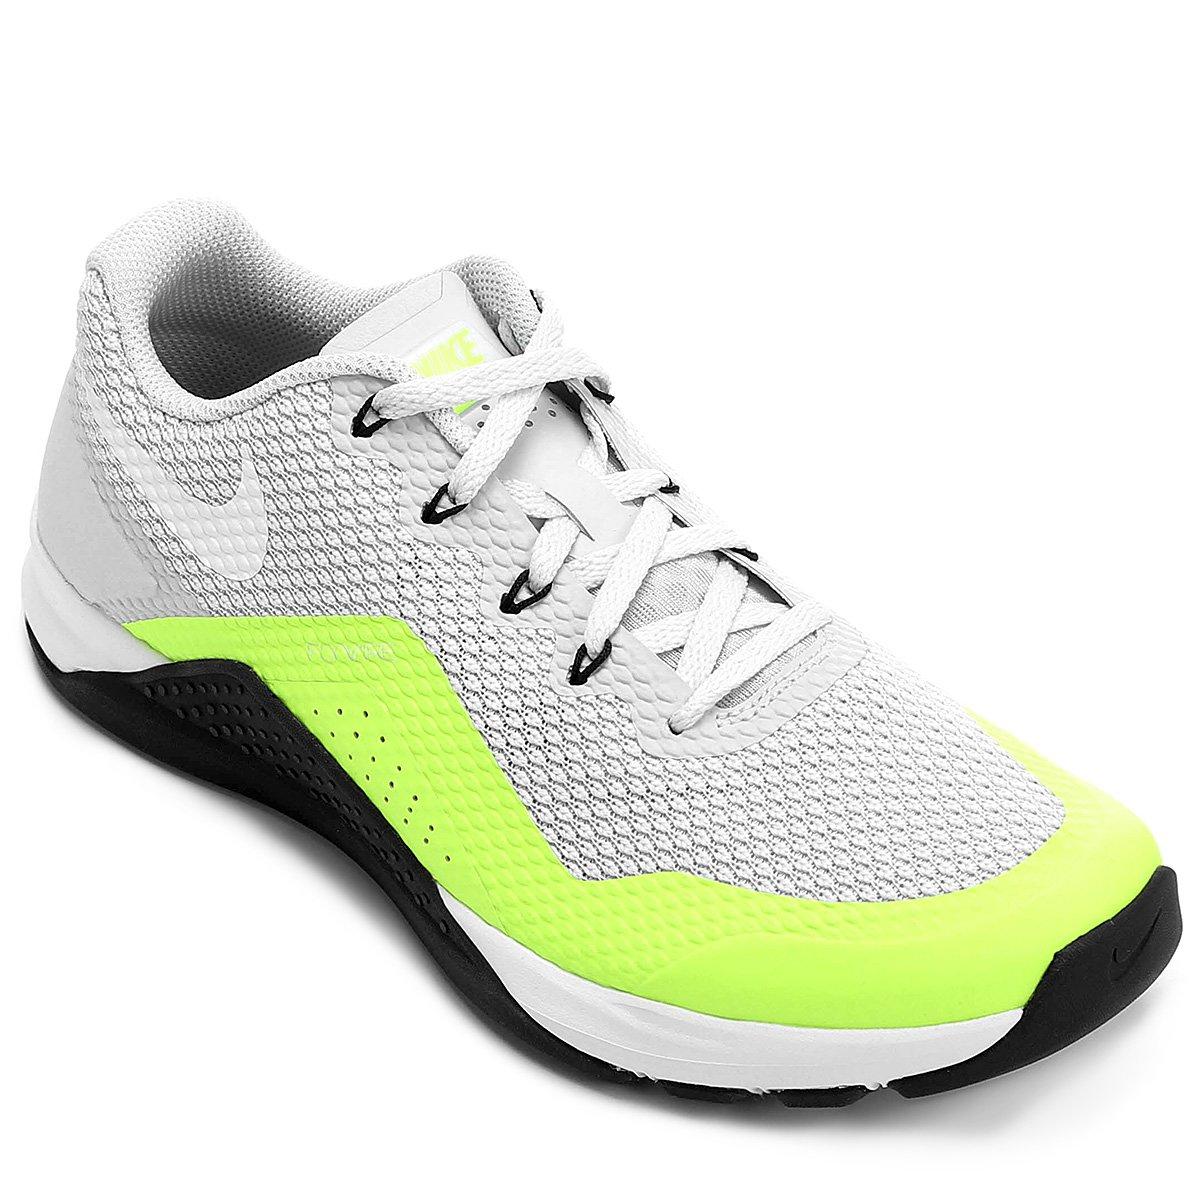 b2bf4fae408 Tênis Nike Metcon Repper DSX Masculino - Compre Agora